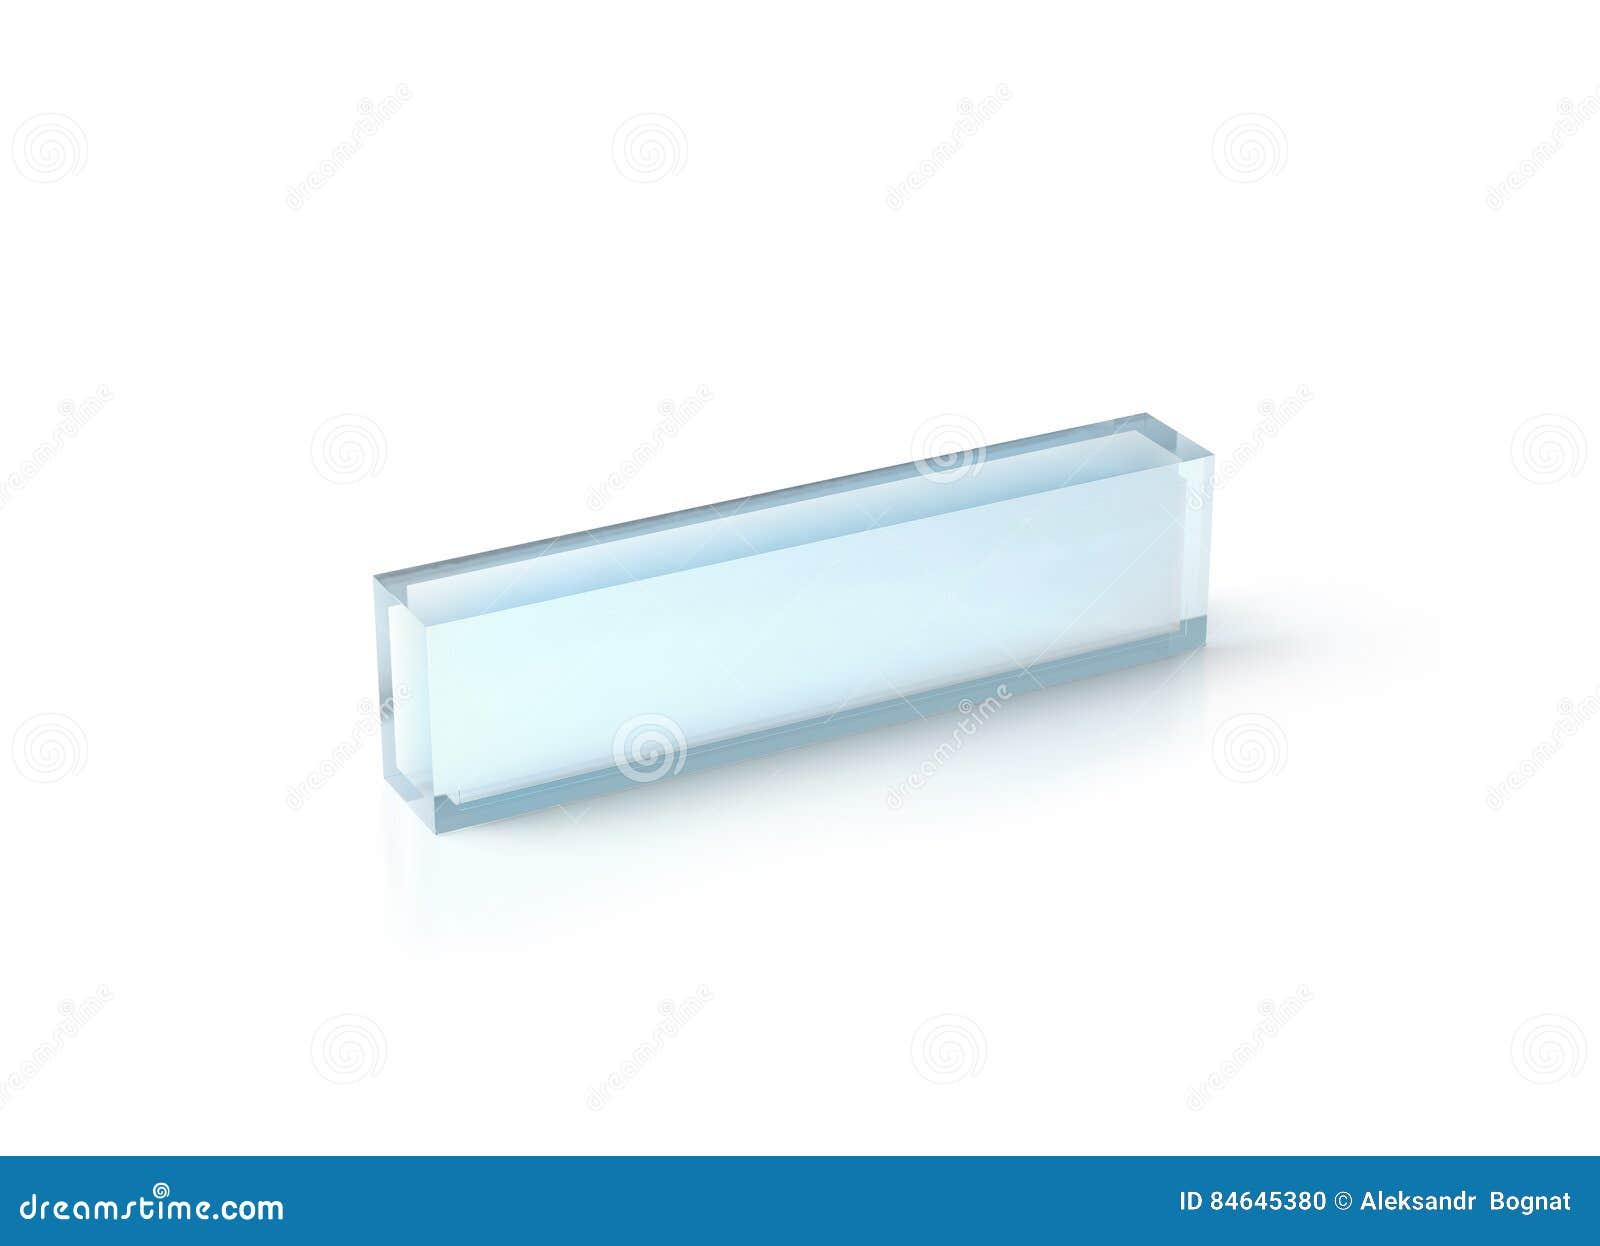 Blank Transparent Acrylic Desk Block Mockup Stock Photo